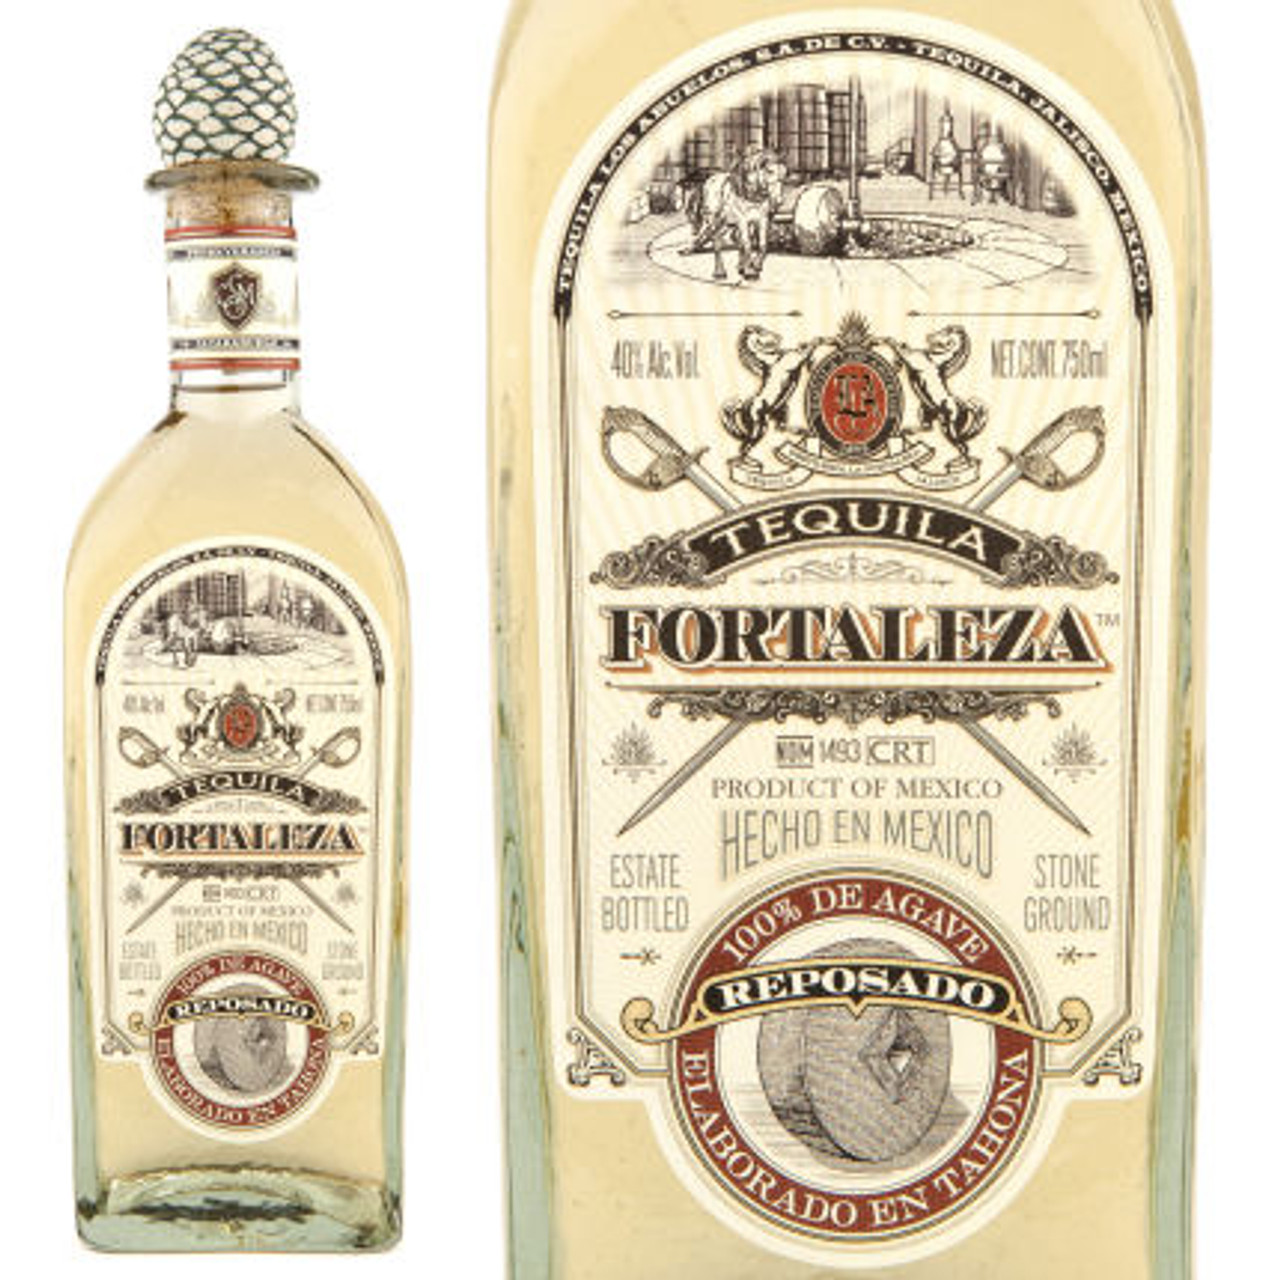 fortaleza-reposado-tequila__25879.1527982019.jpg